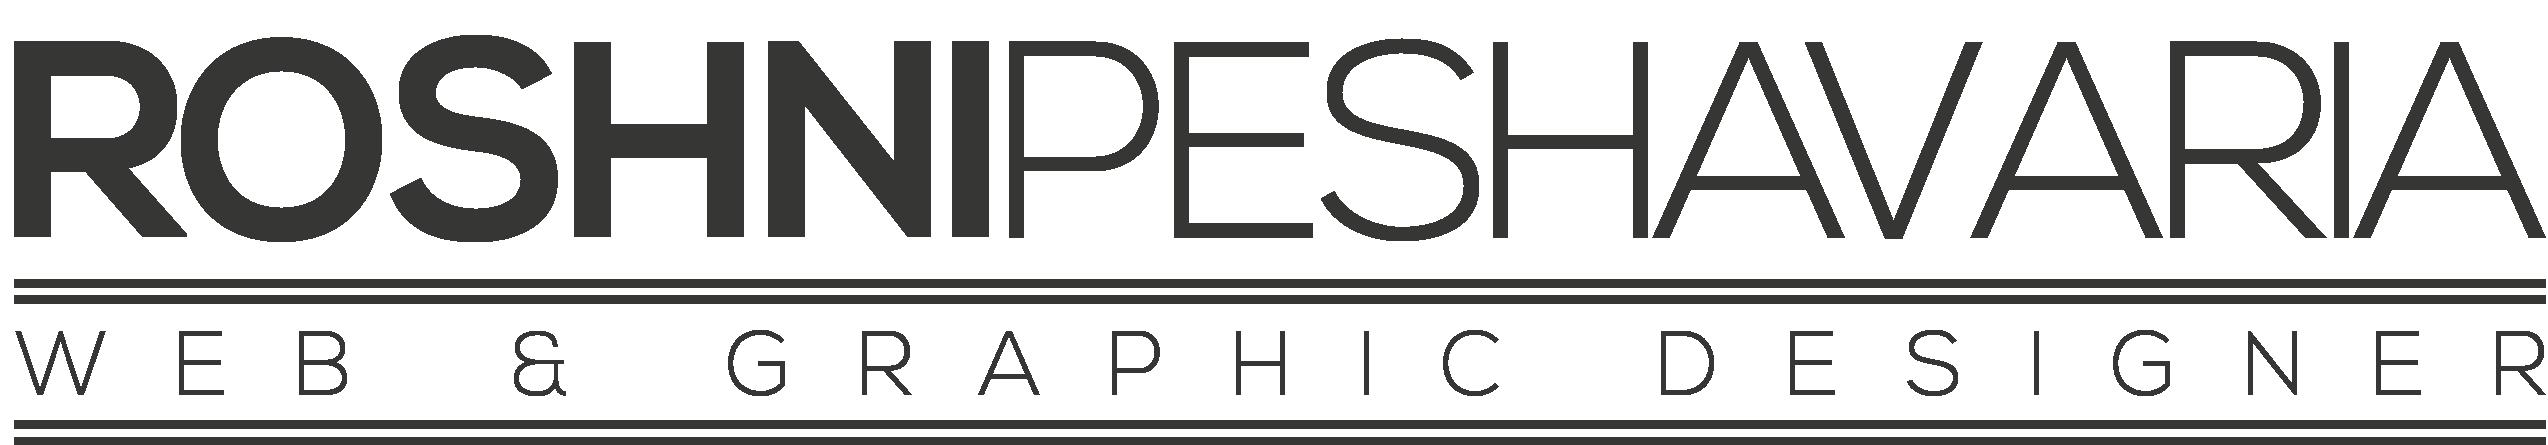 Roshni's Web and Graphic Design Studio